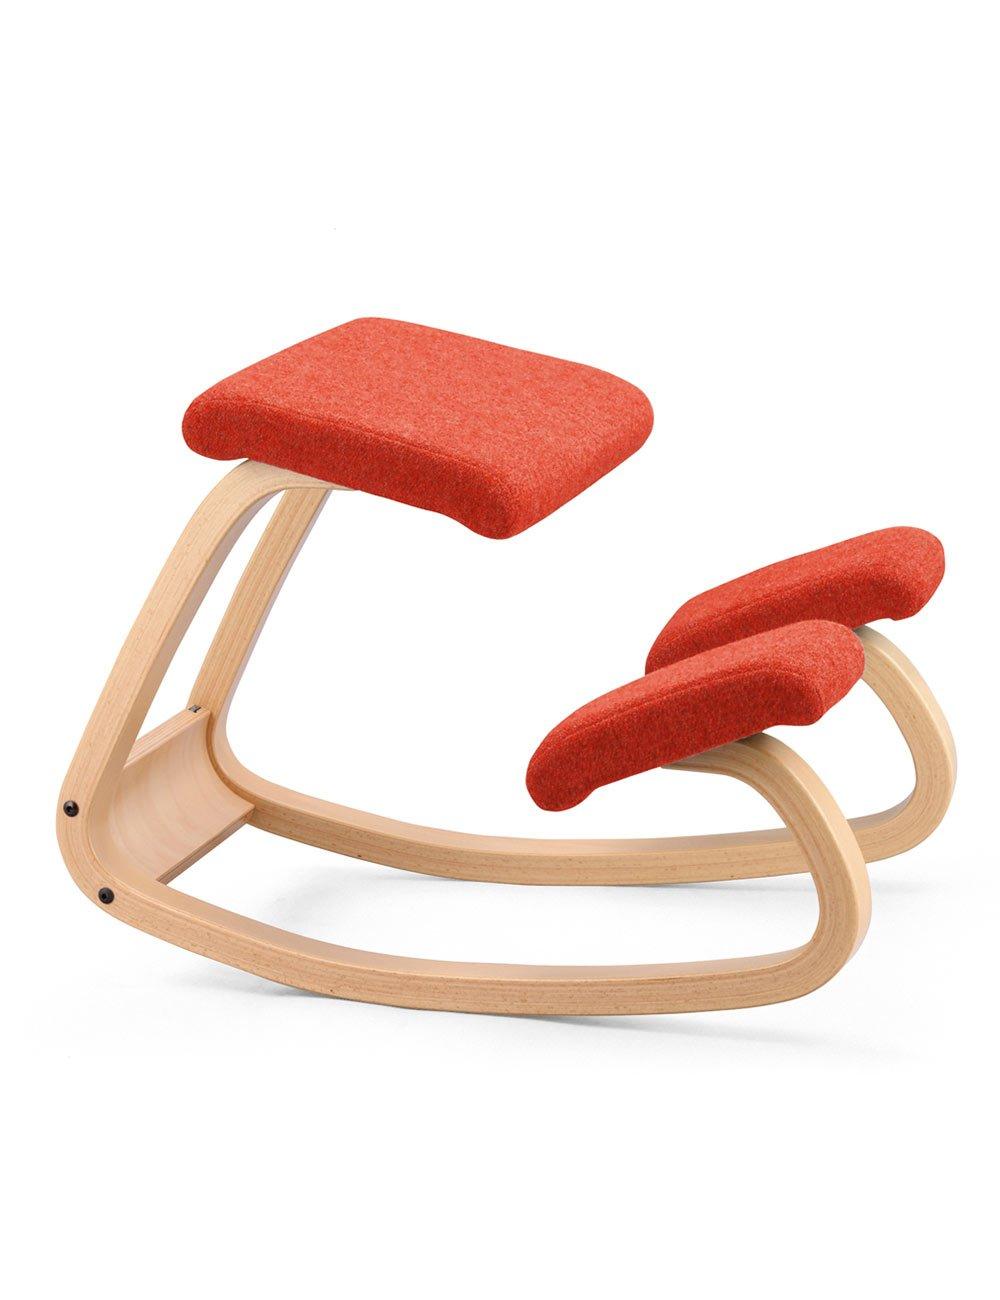 Balans Chairs